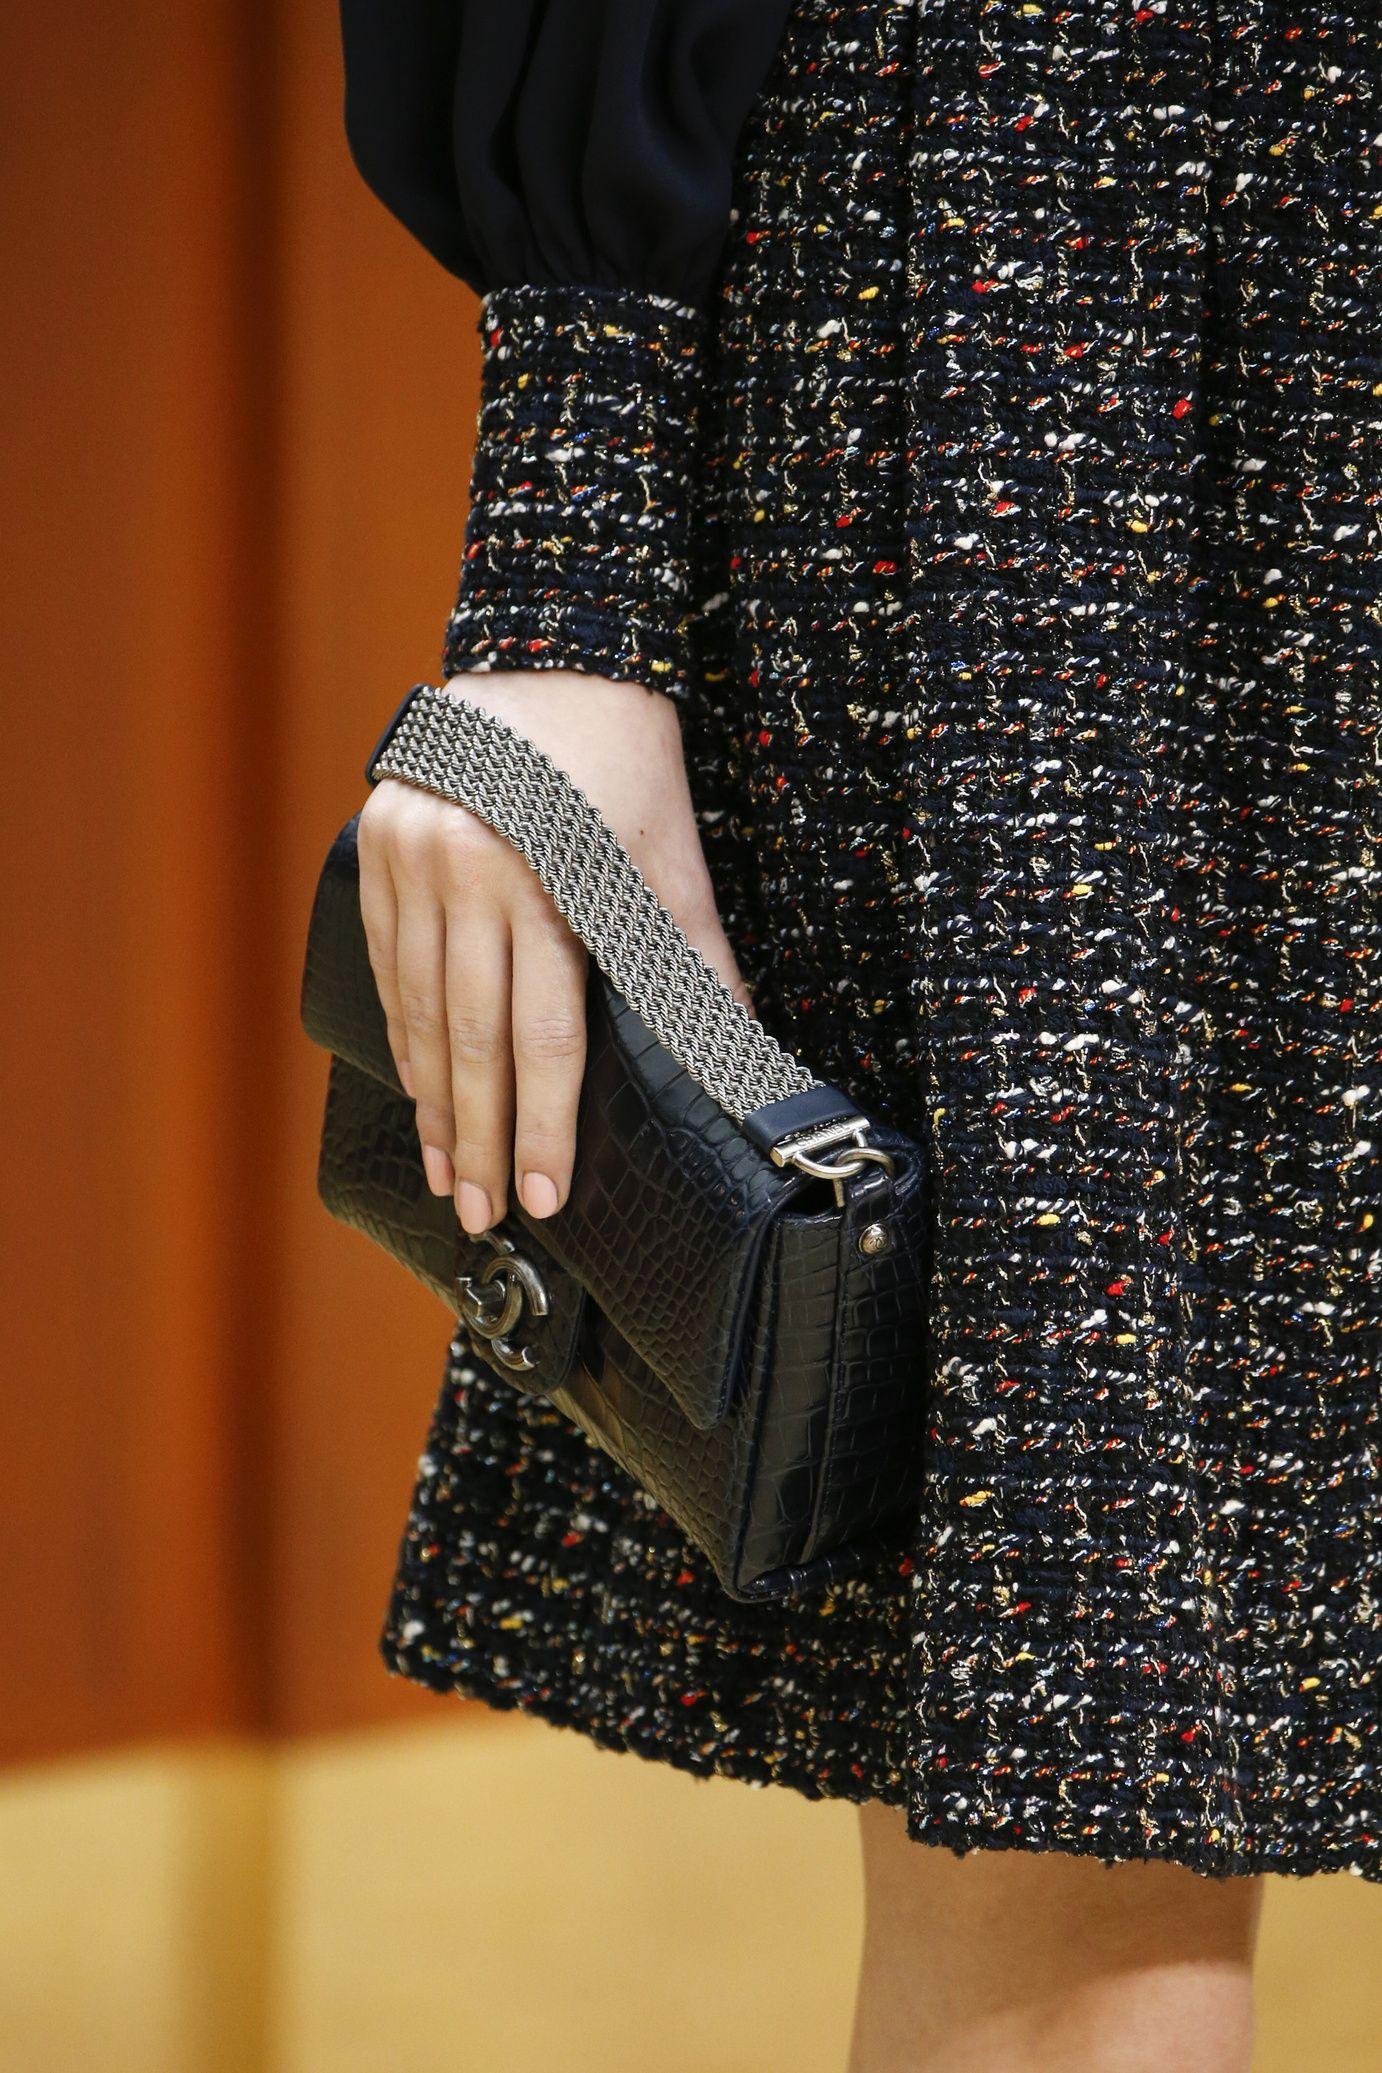 Chanel RTW AW 2015-16  #BrasserieGabrielle Visit espritdegabrielle.com | L'héritage de Coco Chanel #espritdegabrielle